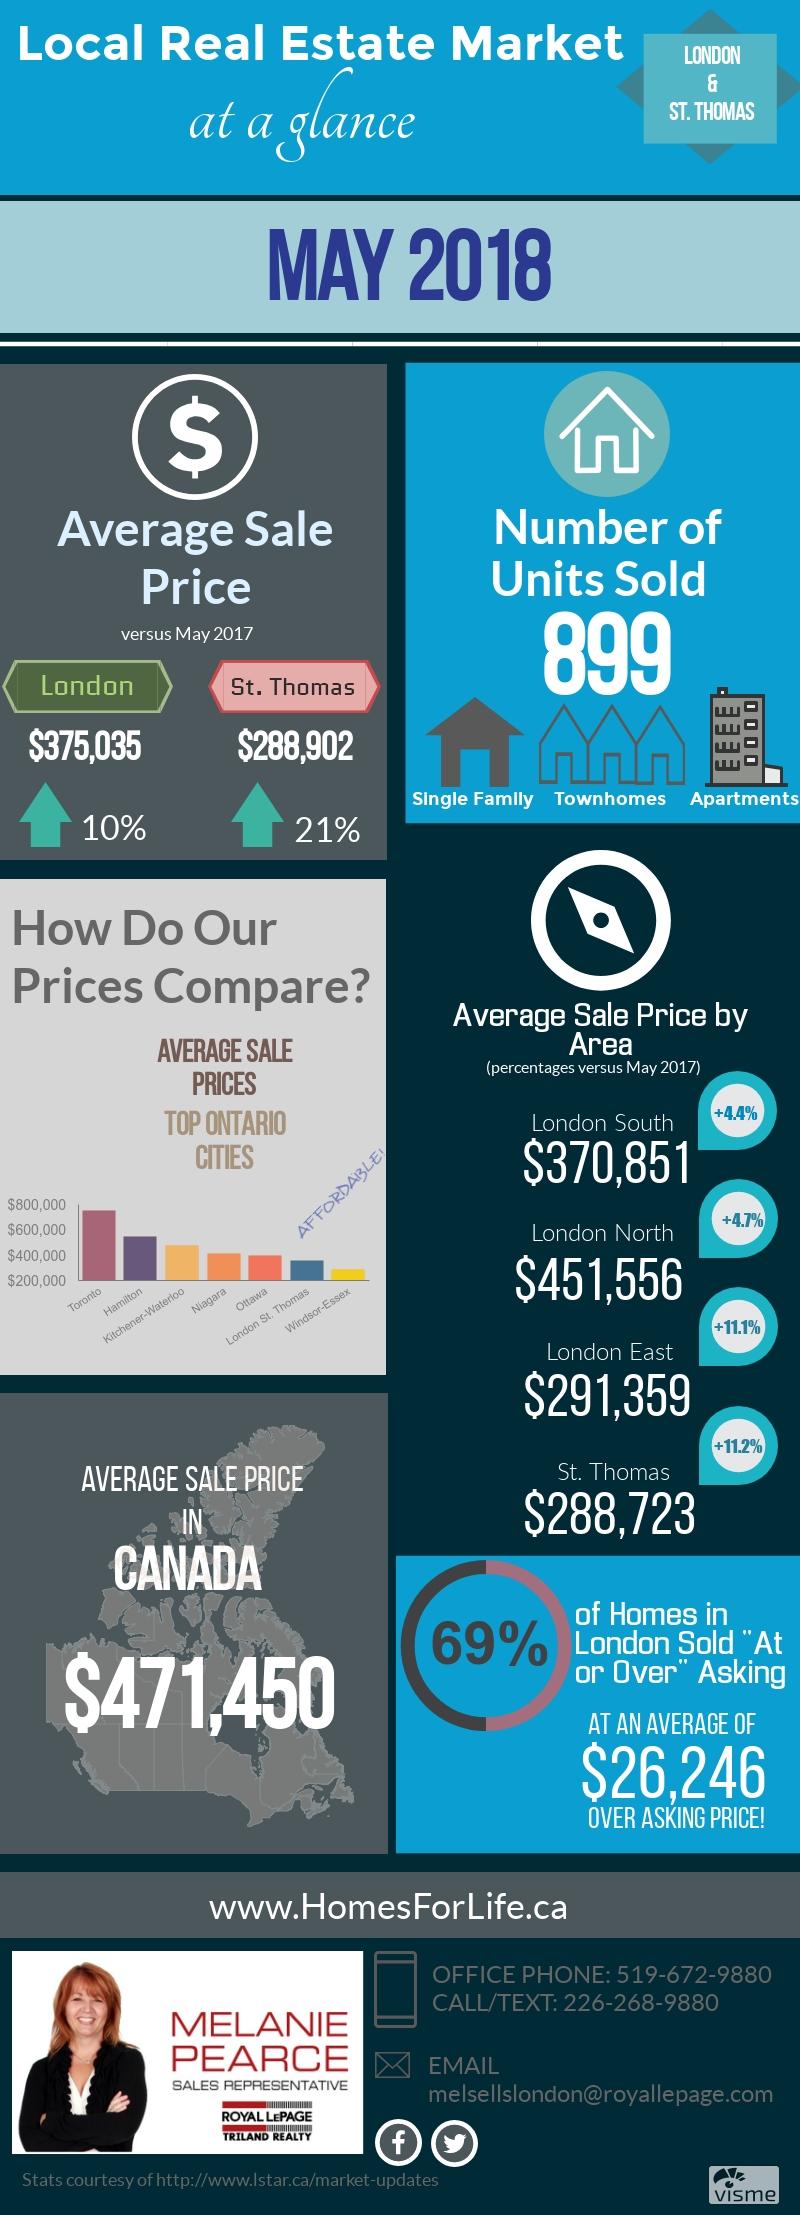 Melanie-Pearce-London-Ontario-Real-Estate-Market-Stats-May 2018.jpg